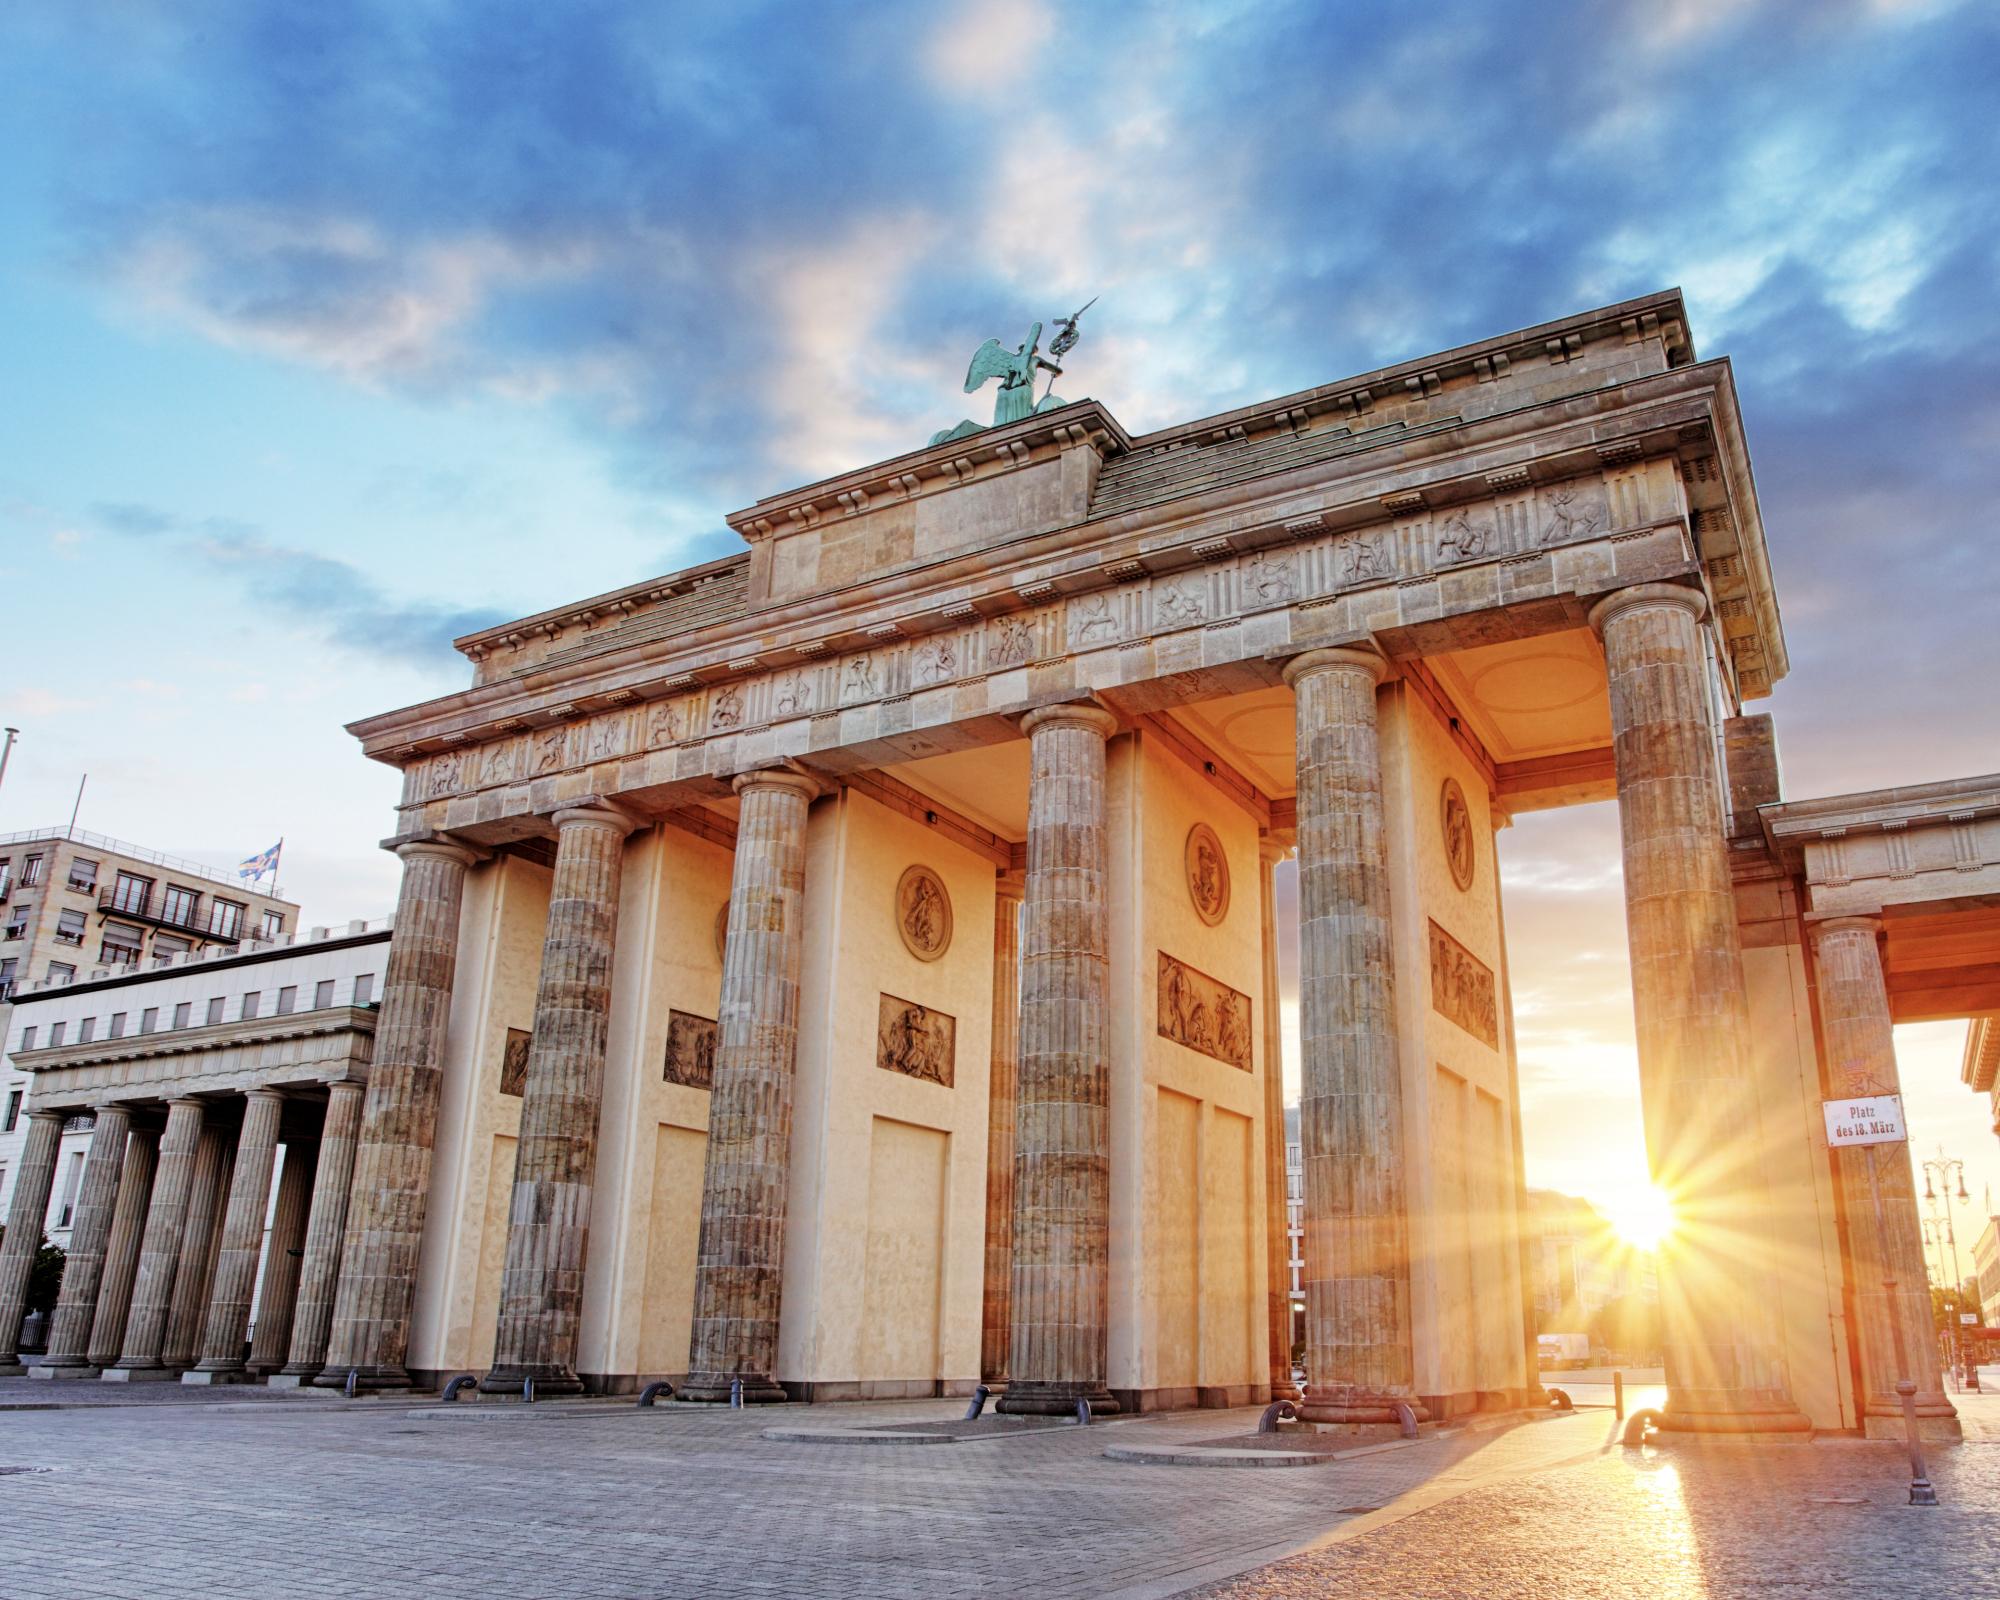 Pariser Platz in Berlin